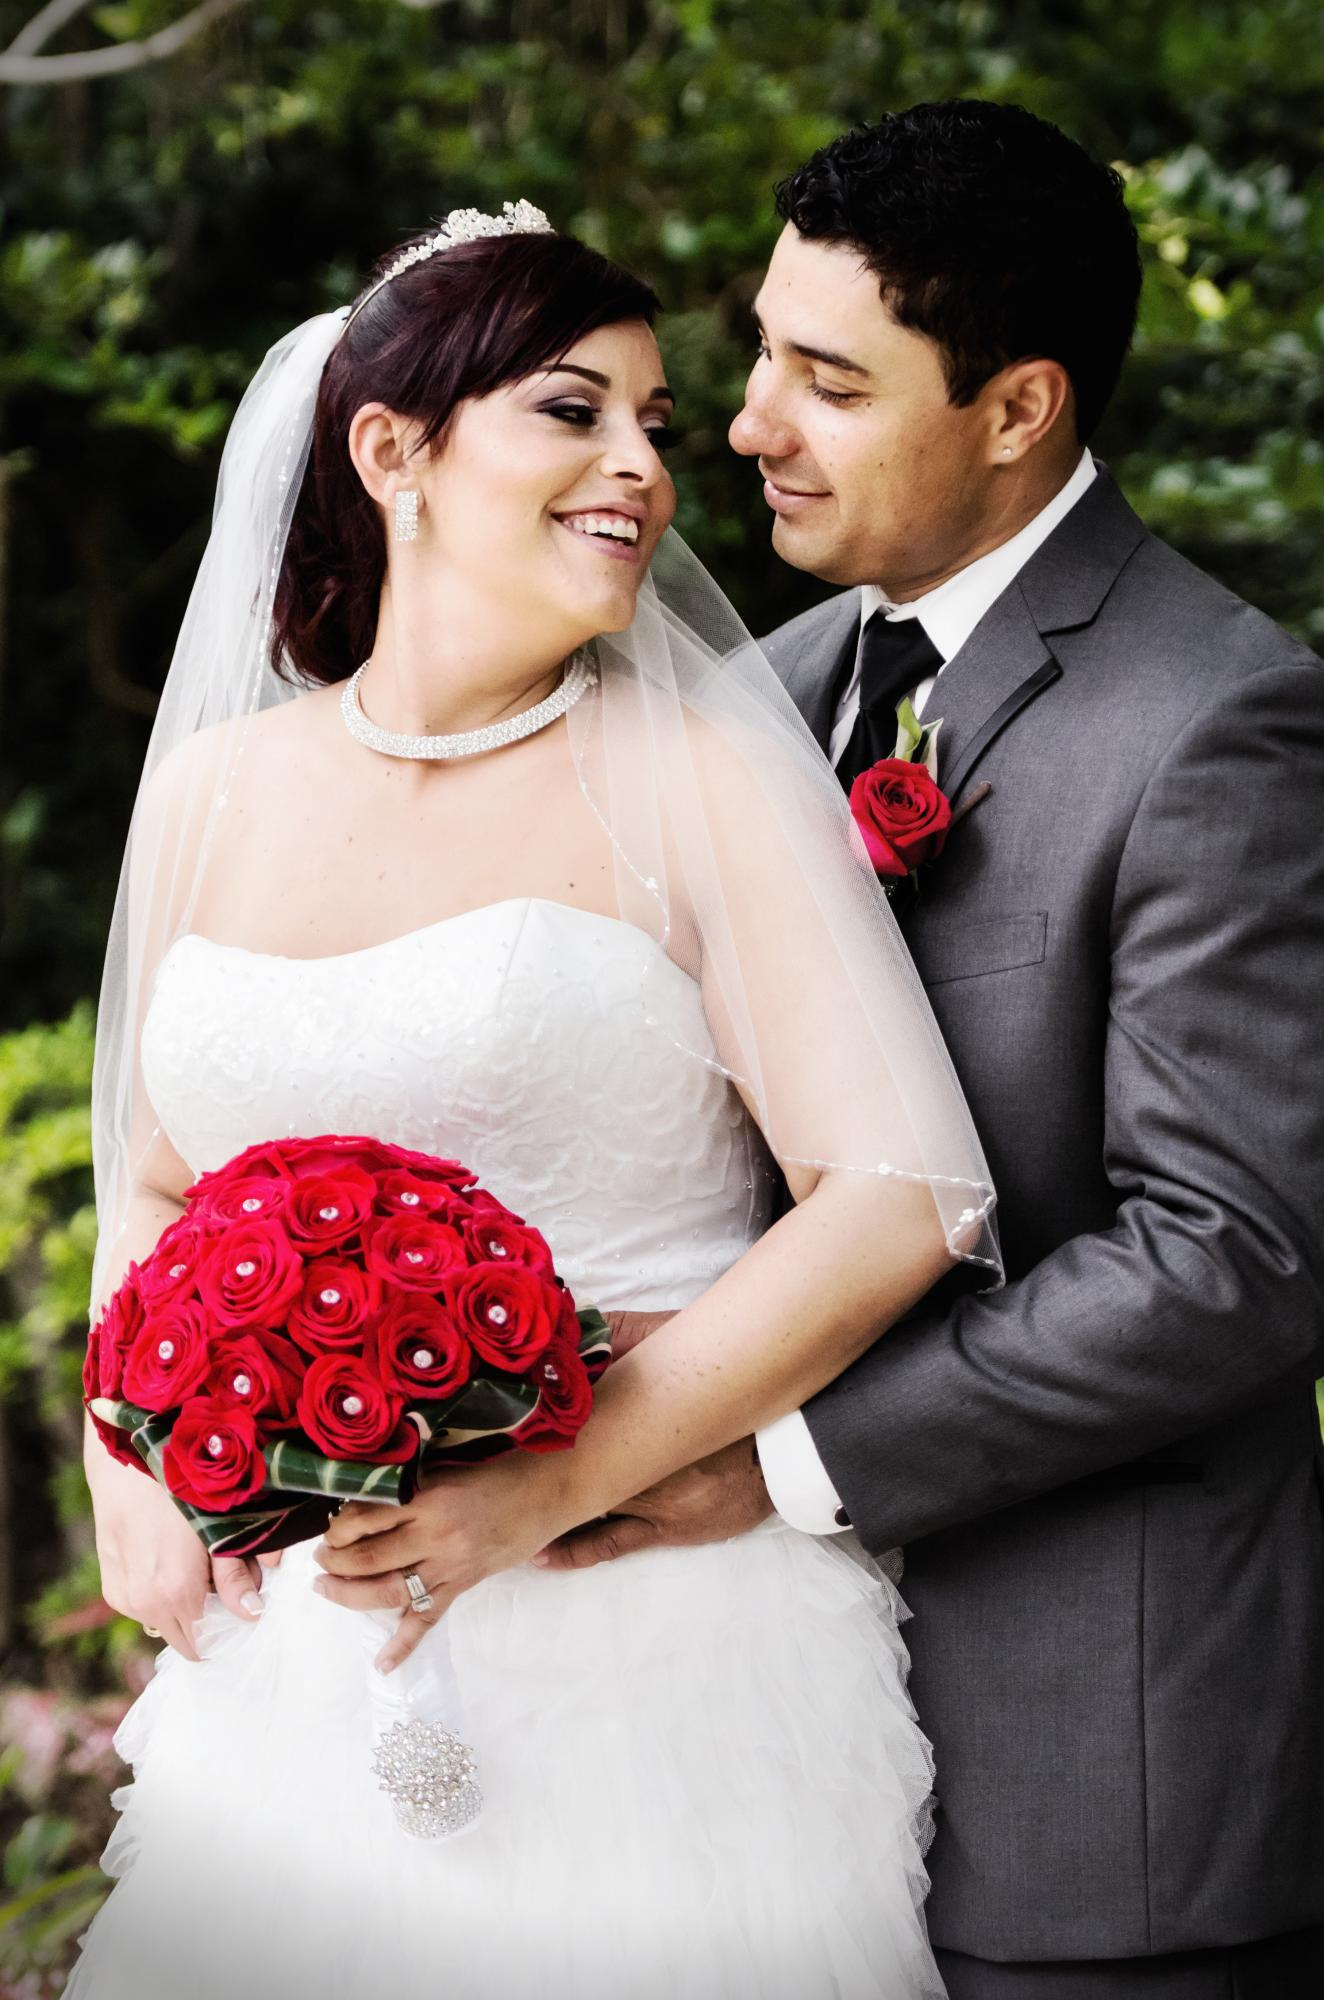 Casamentos-125.jpg